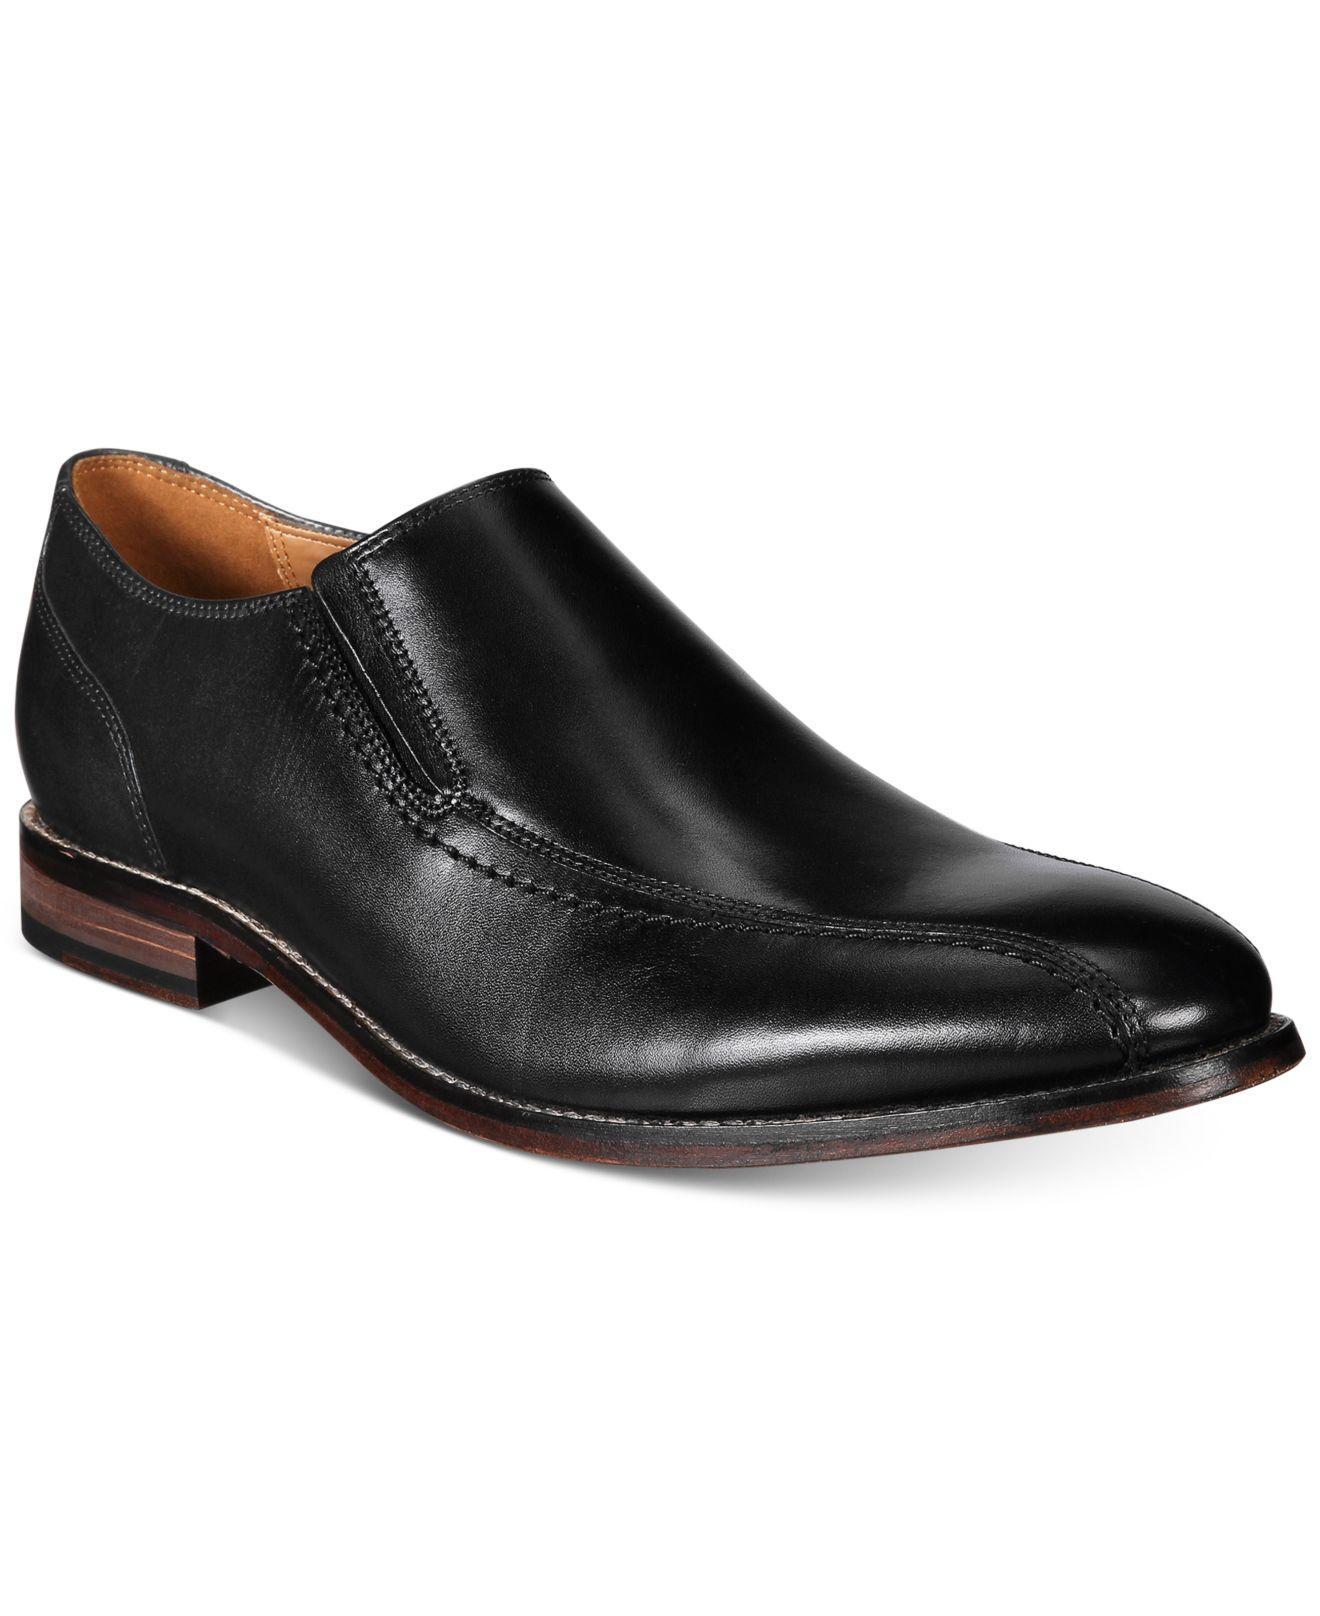 Bostonian Mens Shoes Canada